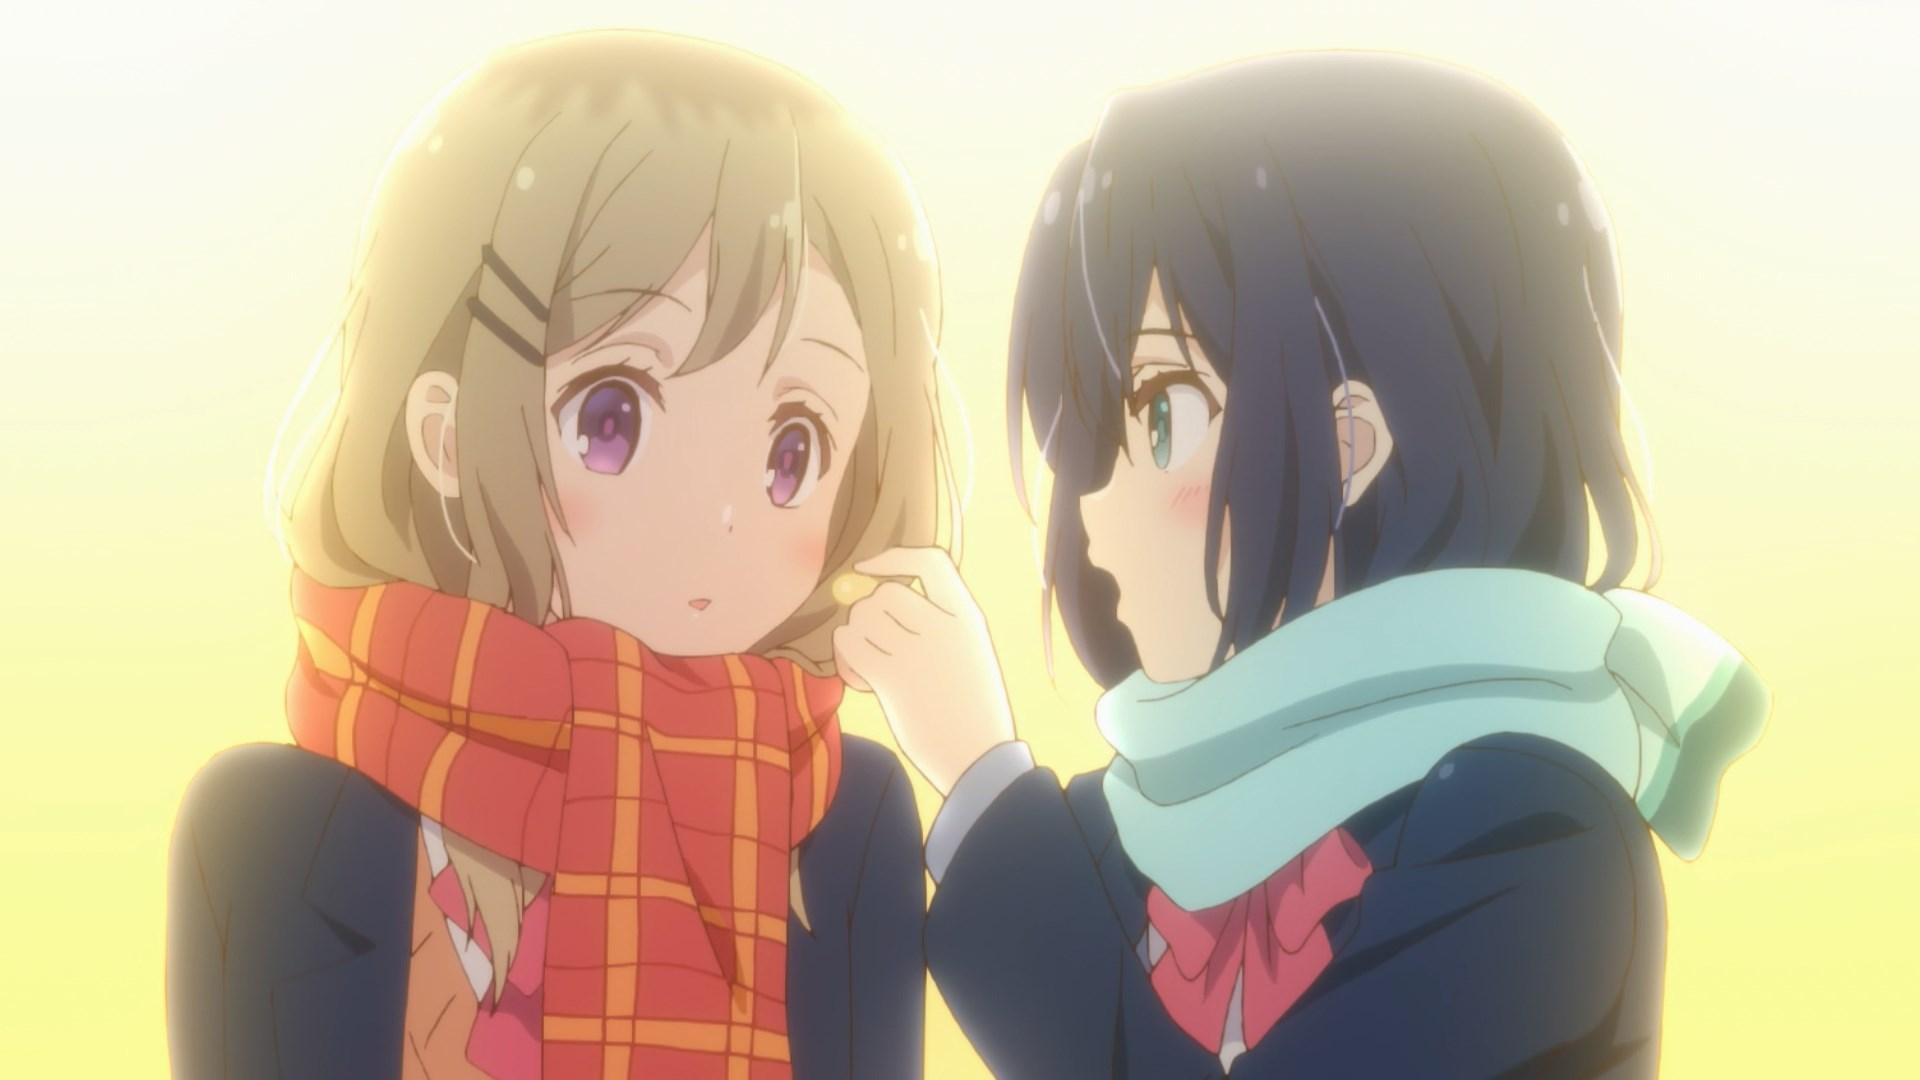 Adachi about to feed Shimamura